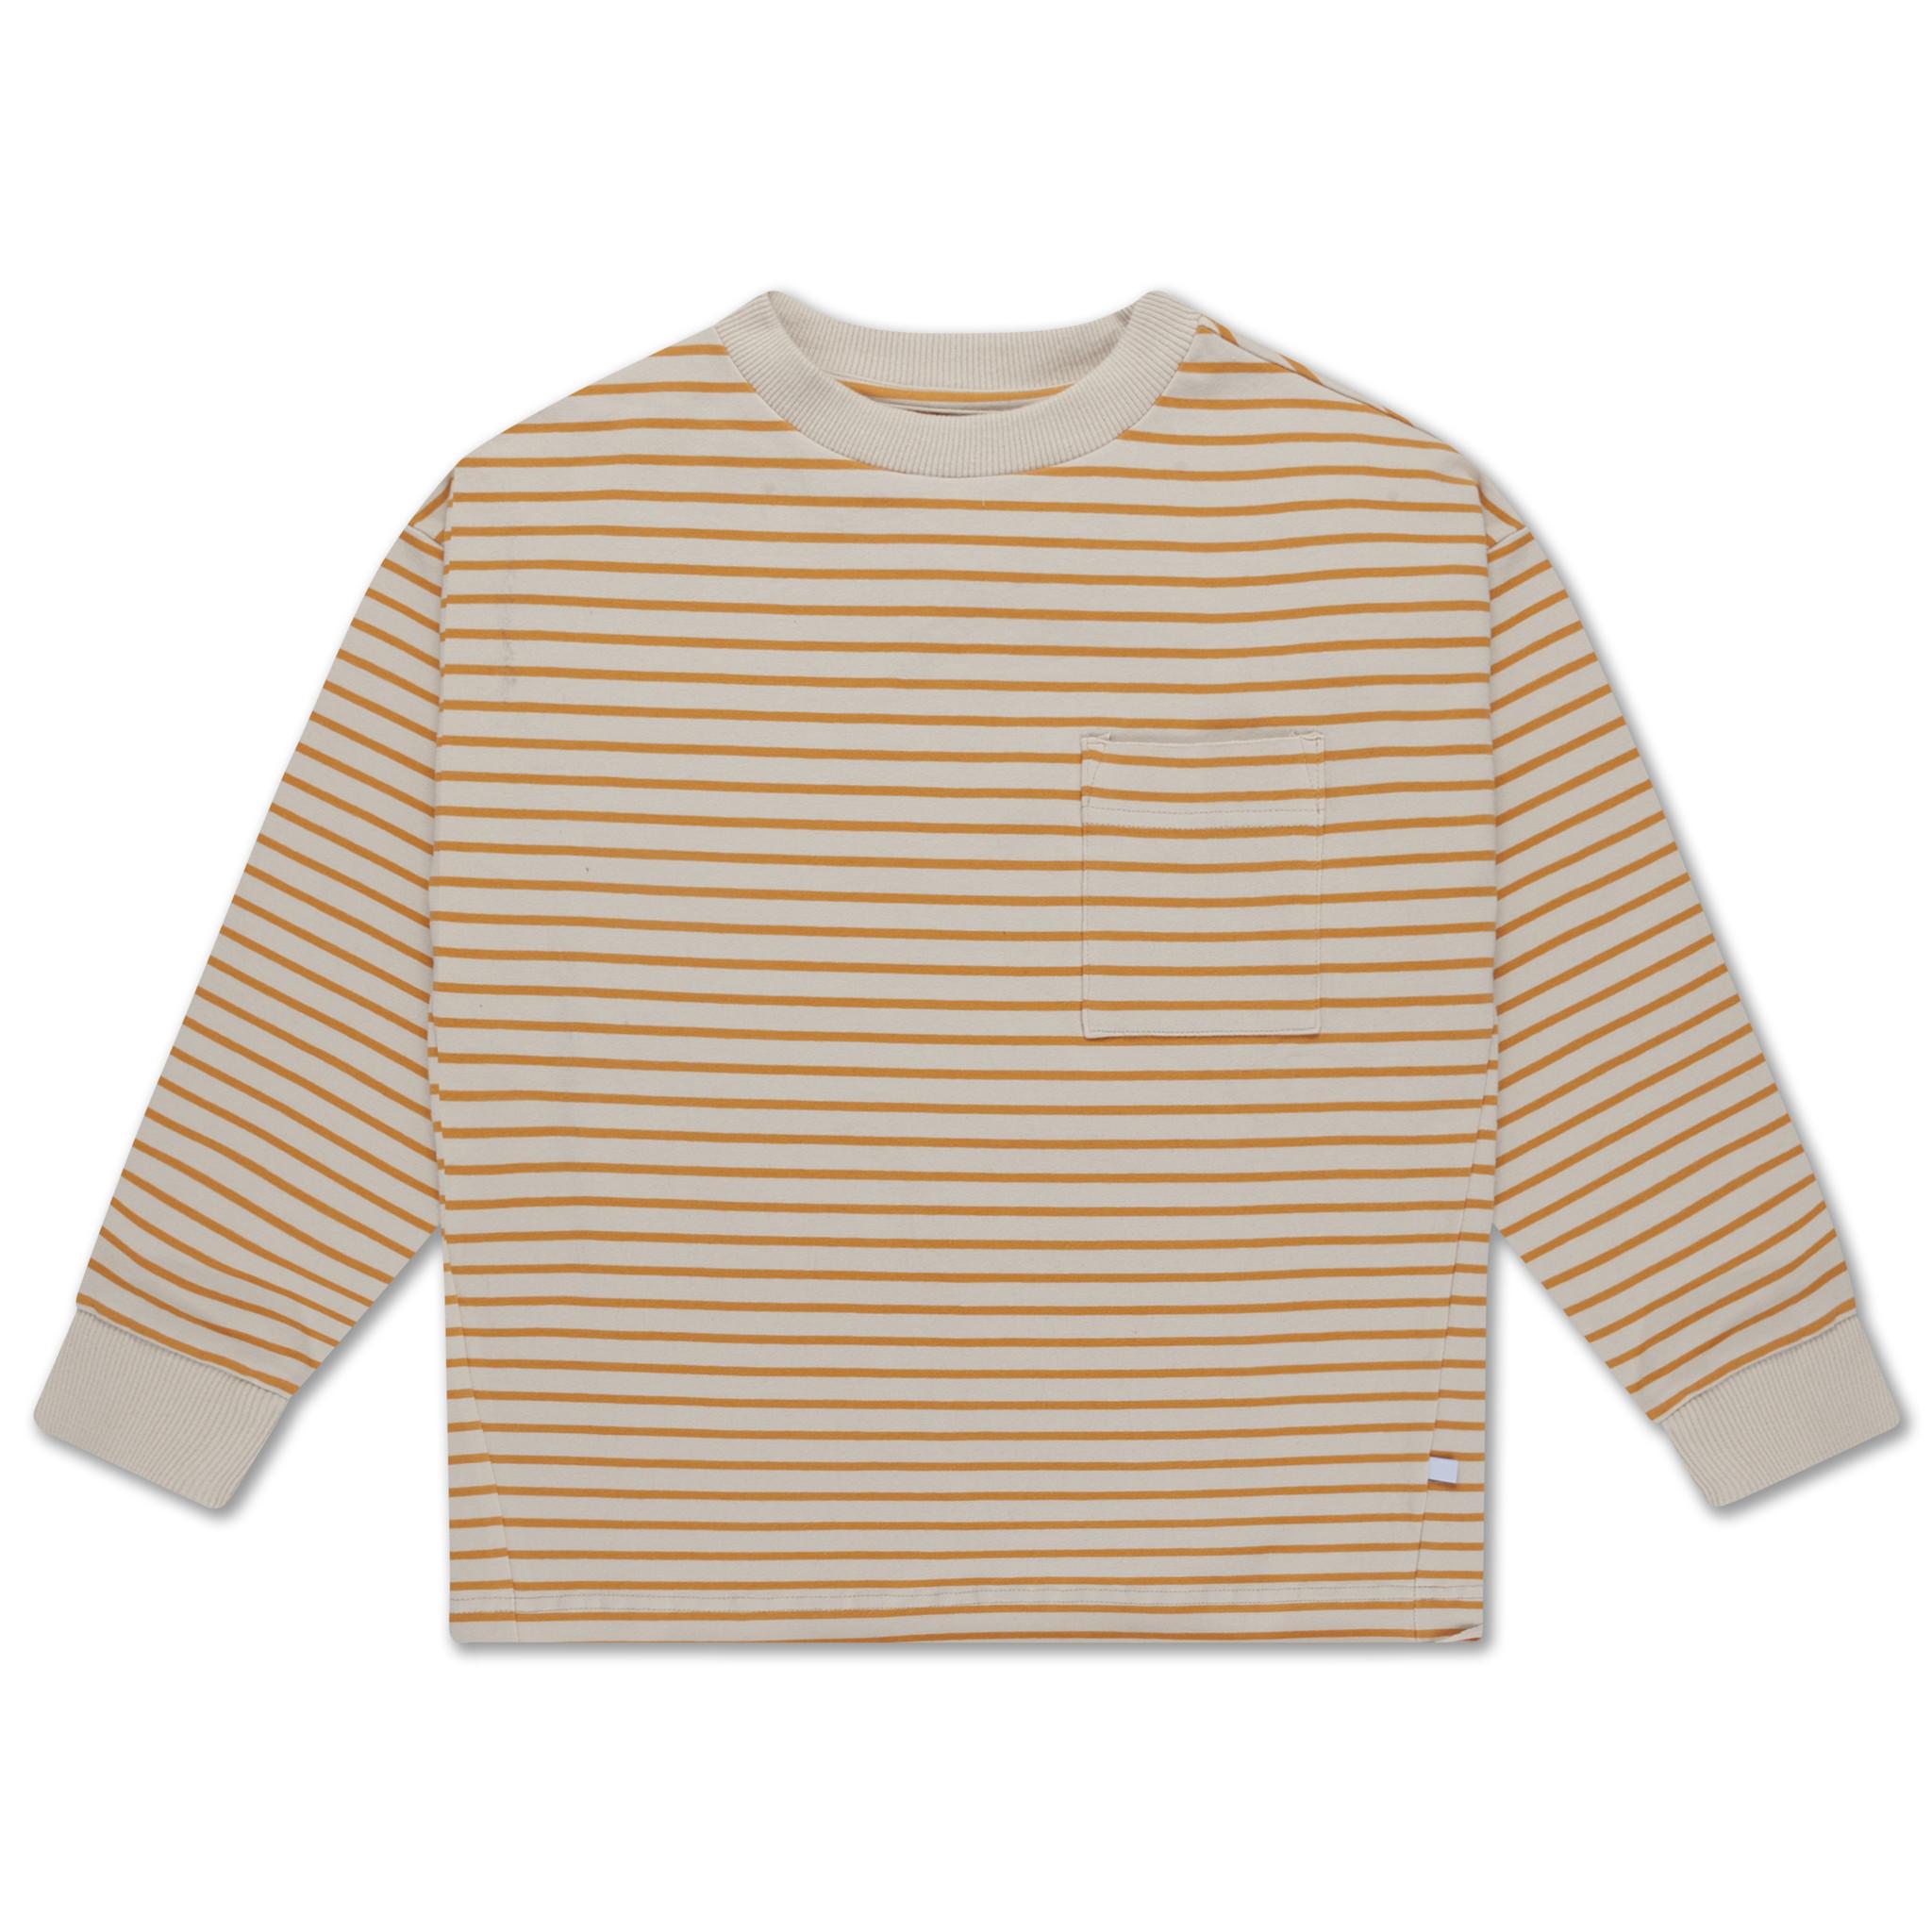 Sweat Tee - Butterscotch stripe-1